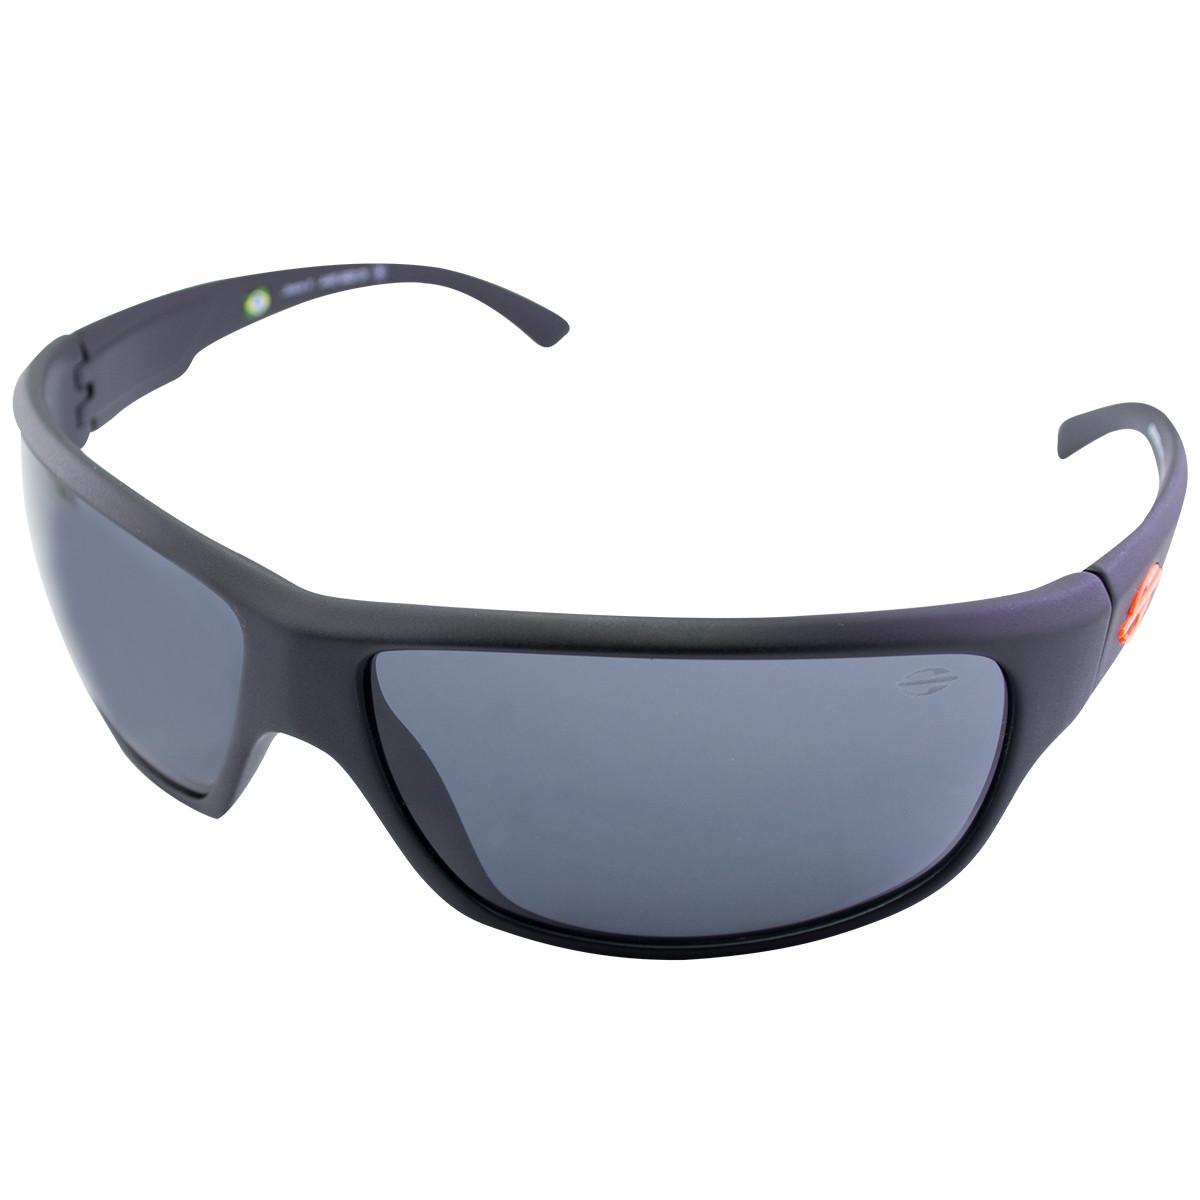 Óculos Mormaii Joaca 2 Preto Fosco  Lentes Cinza Logo Laranja ... 4ef424c4ed